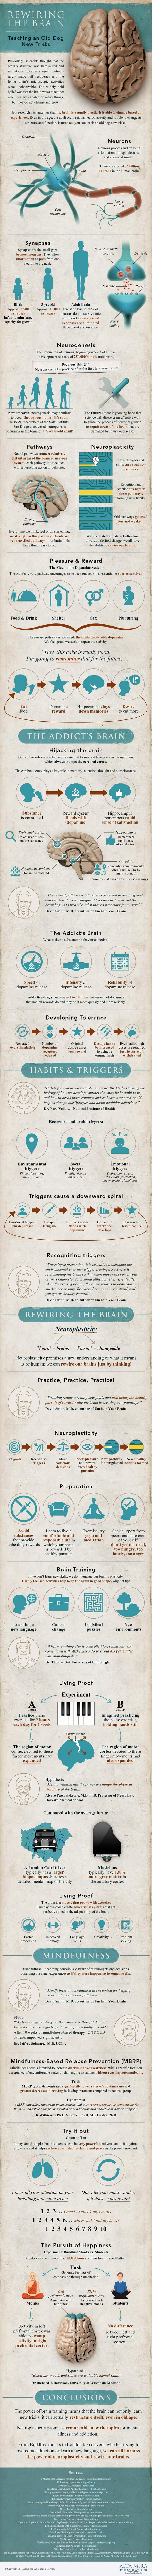 Rewiring_the_Brain_Infographic.jpg